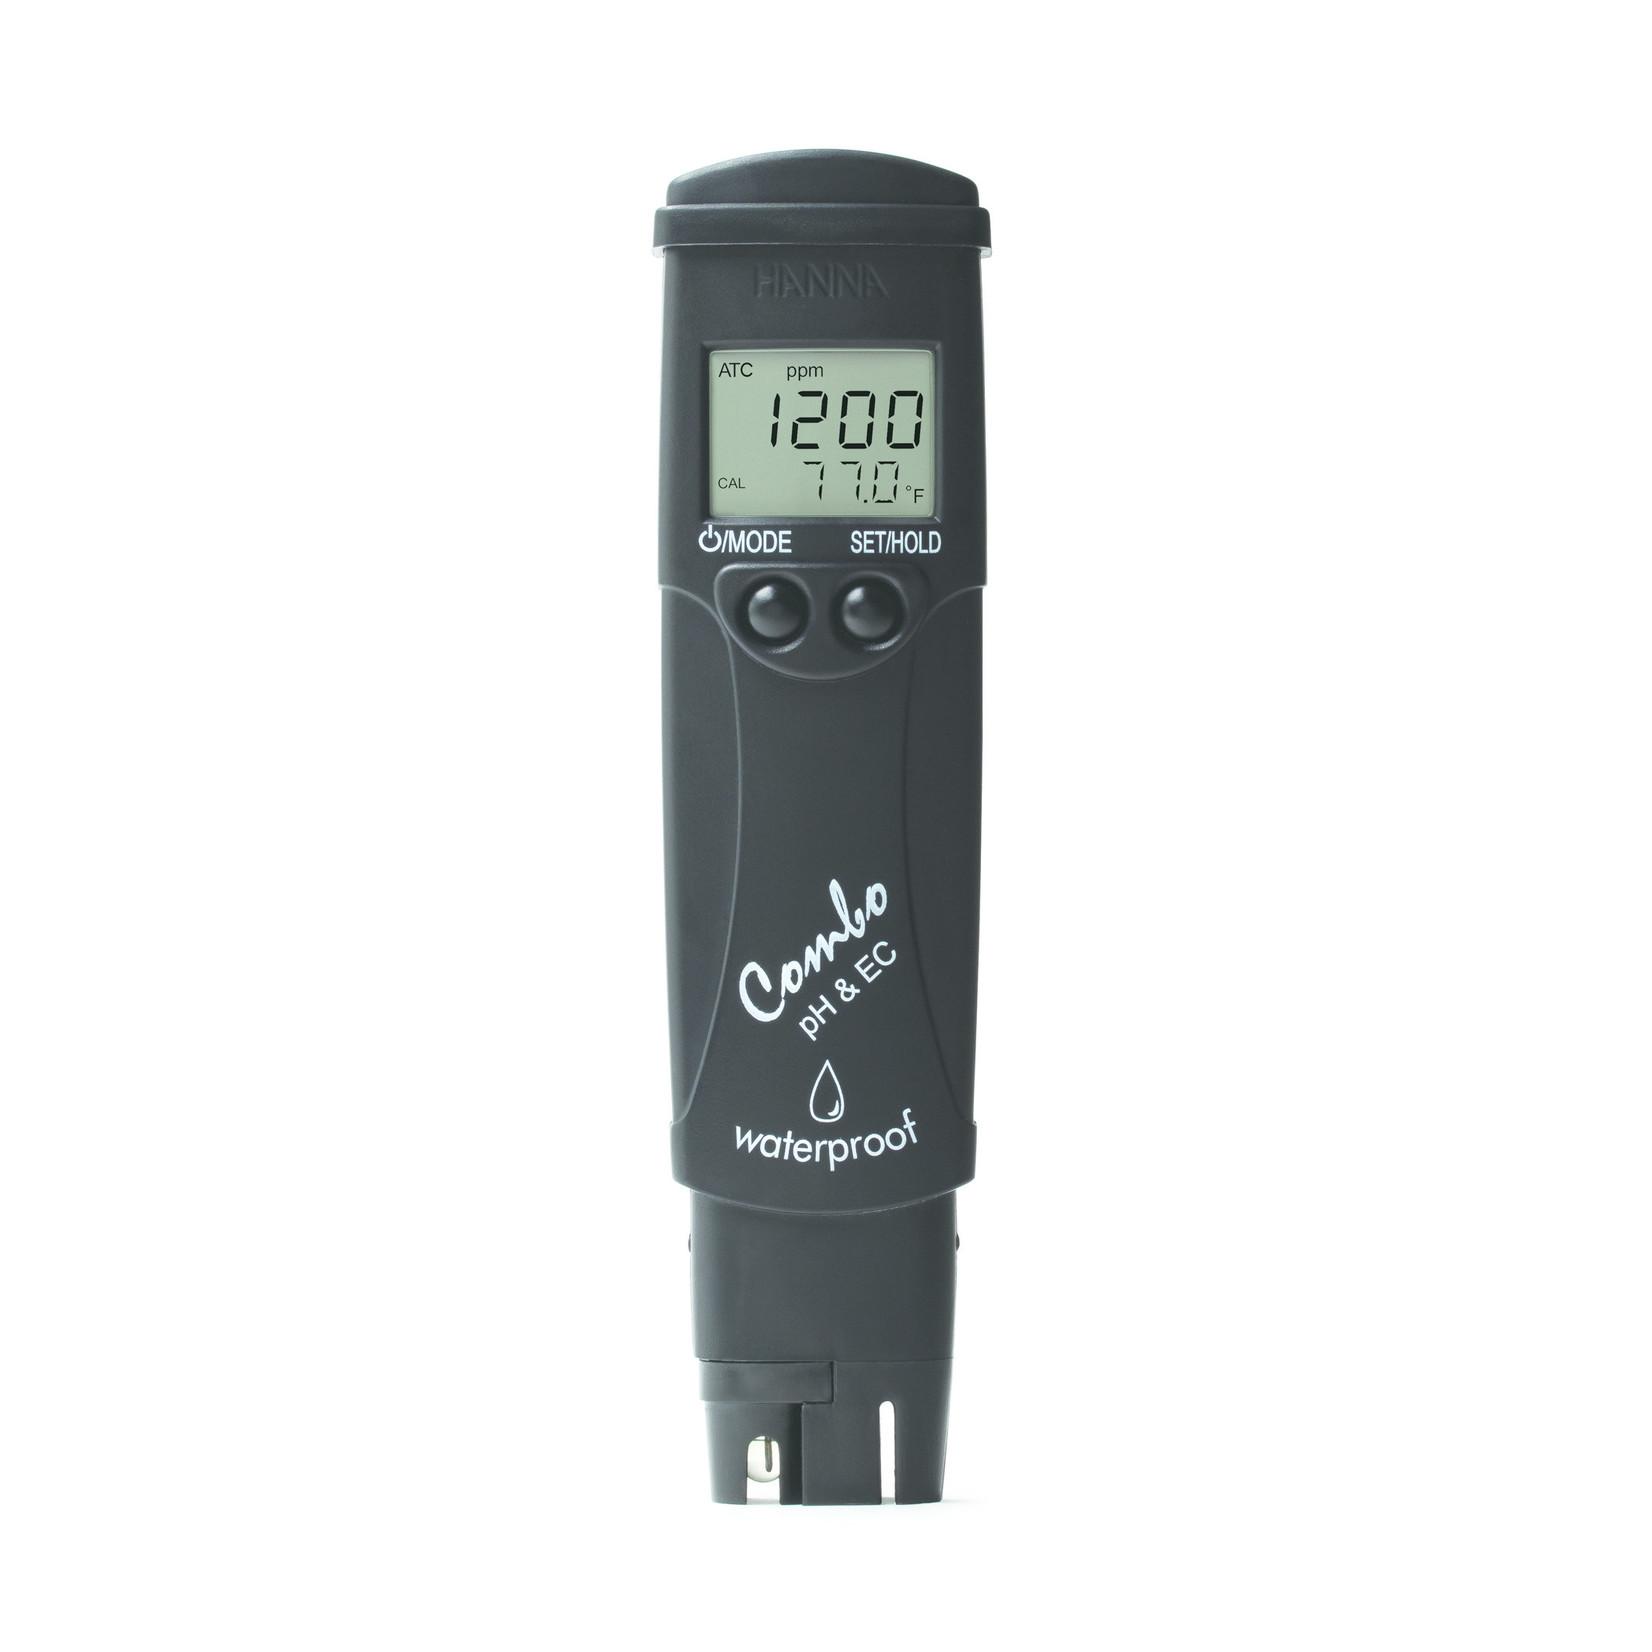 Hanna Instruments HI98130 pH/EC/TDS/temp.-tester, 0-14 pH, EC: 0.00 - 20.00 mS/cm